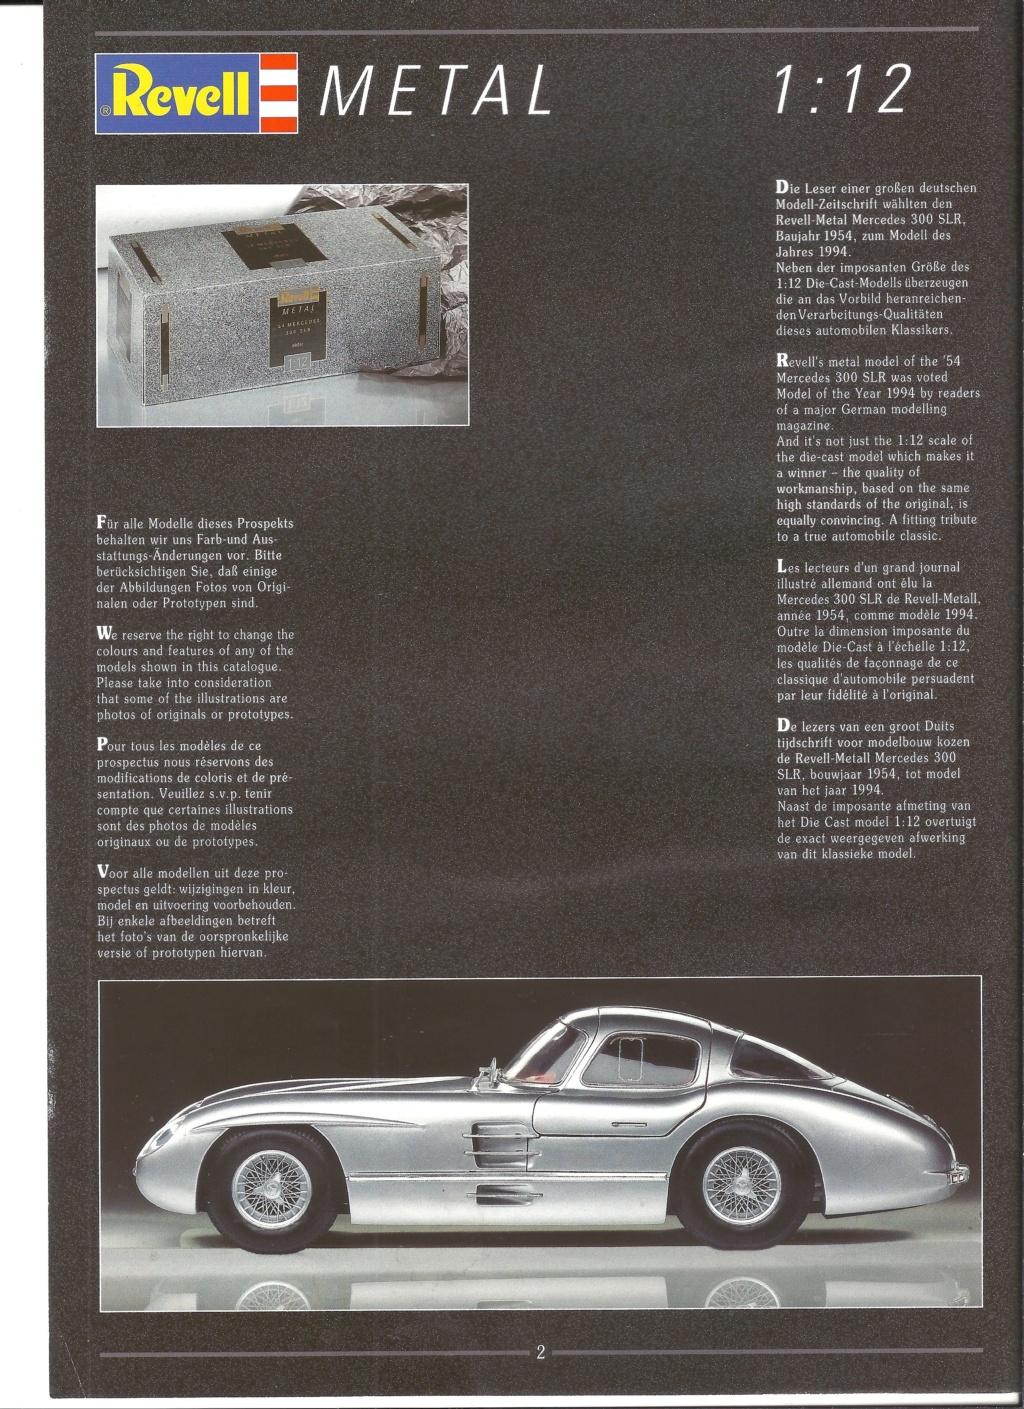 [REVELL 1995] Catalogue METAL miniatures 1995  Revell31